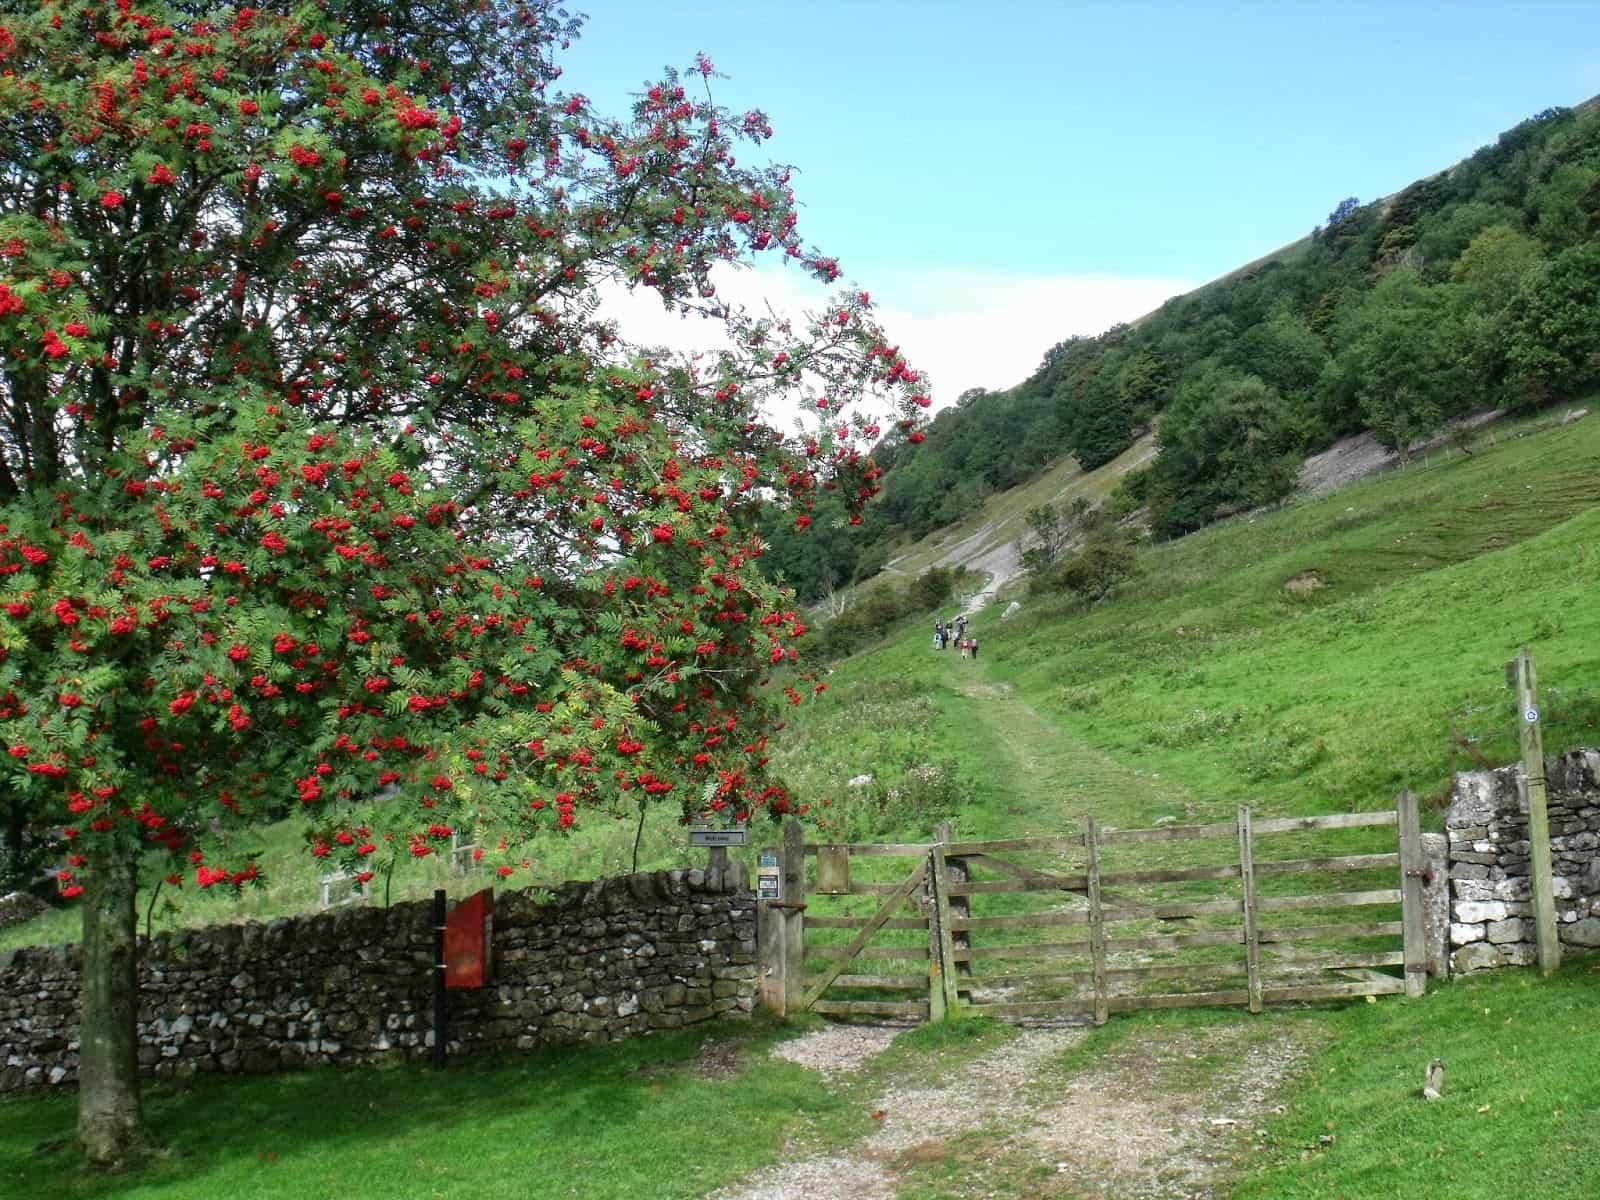 Buckden Rake, Yockenthwaite and the Wharfe on the Dales Way Walking Holiday